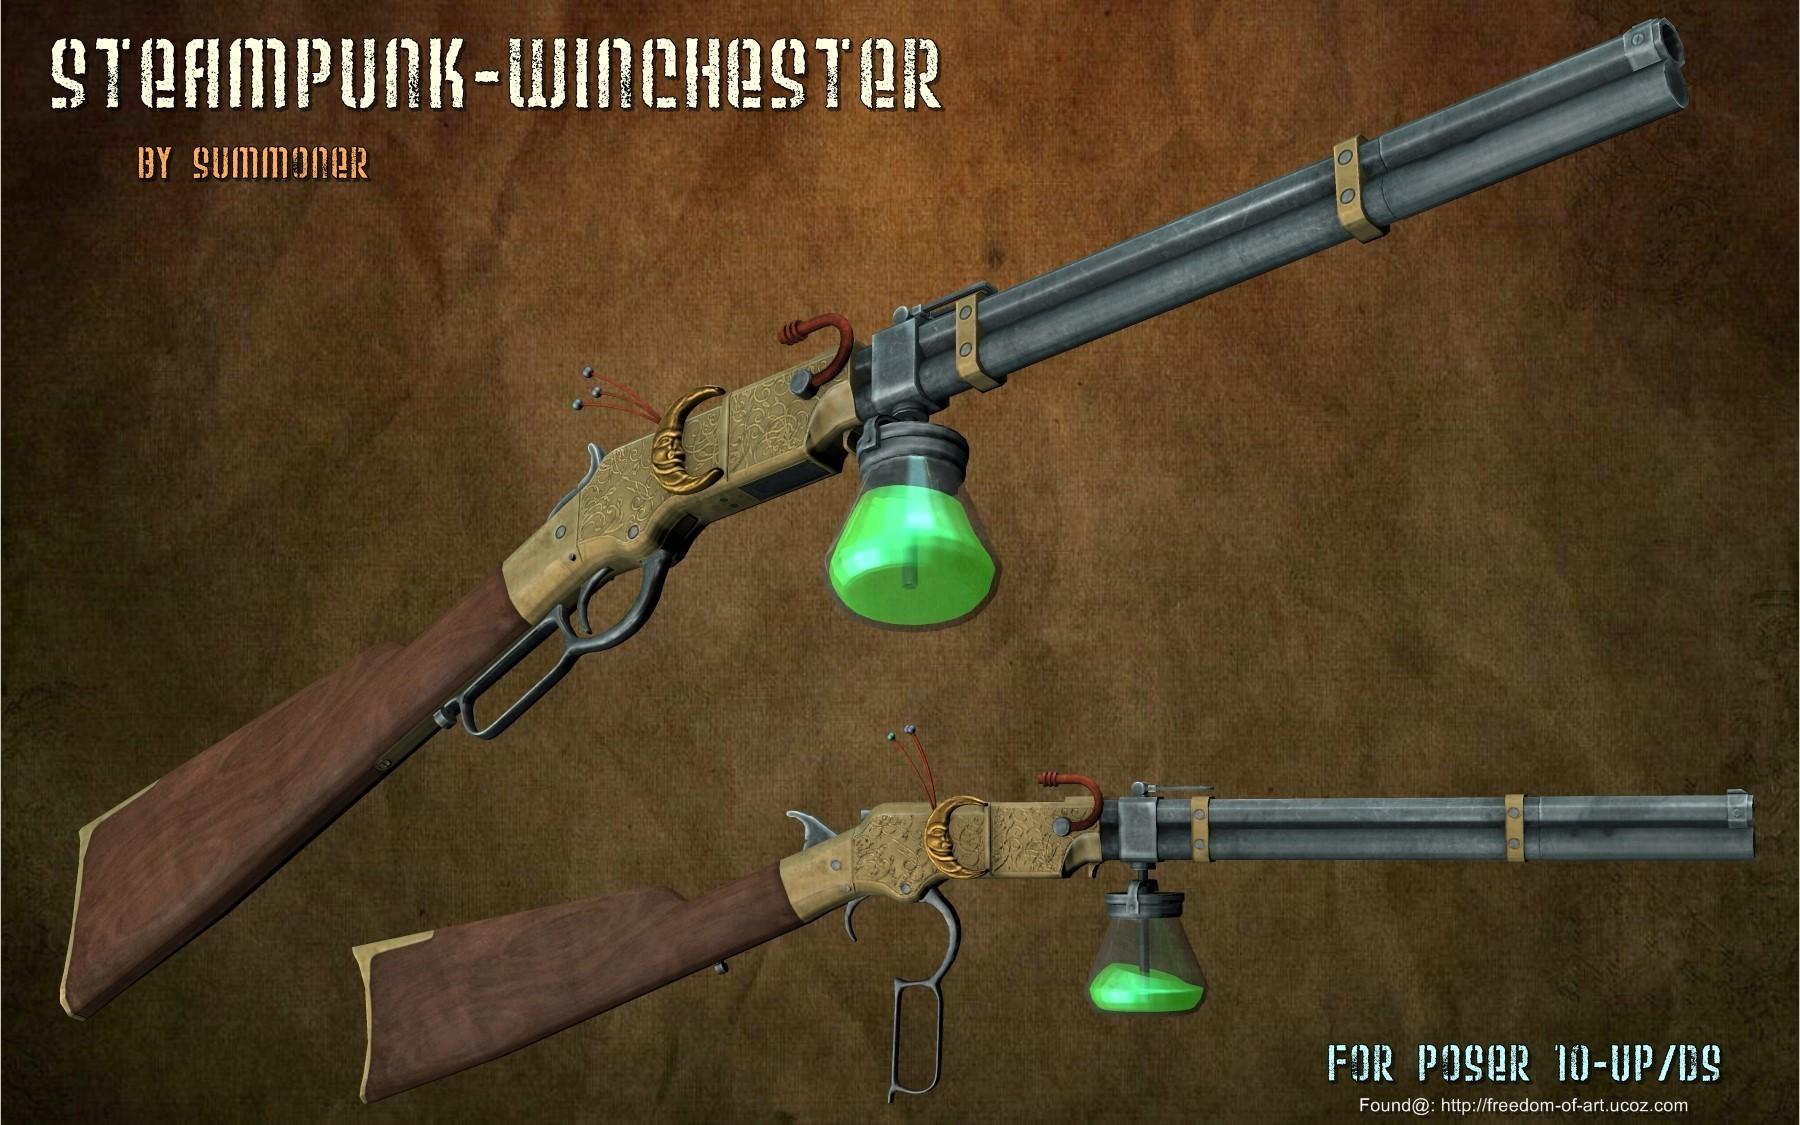 SteamPunk Winchester [Exclusive]